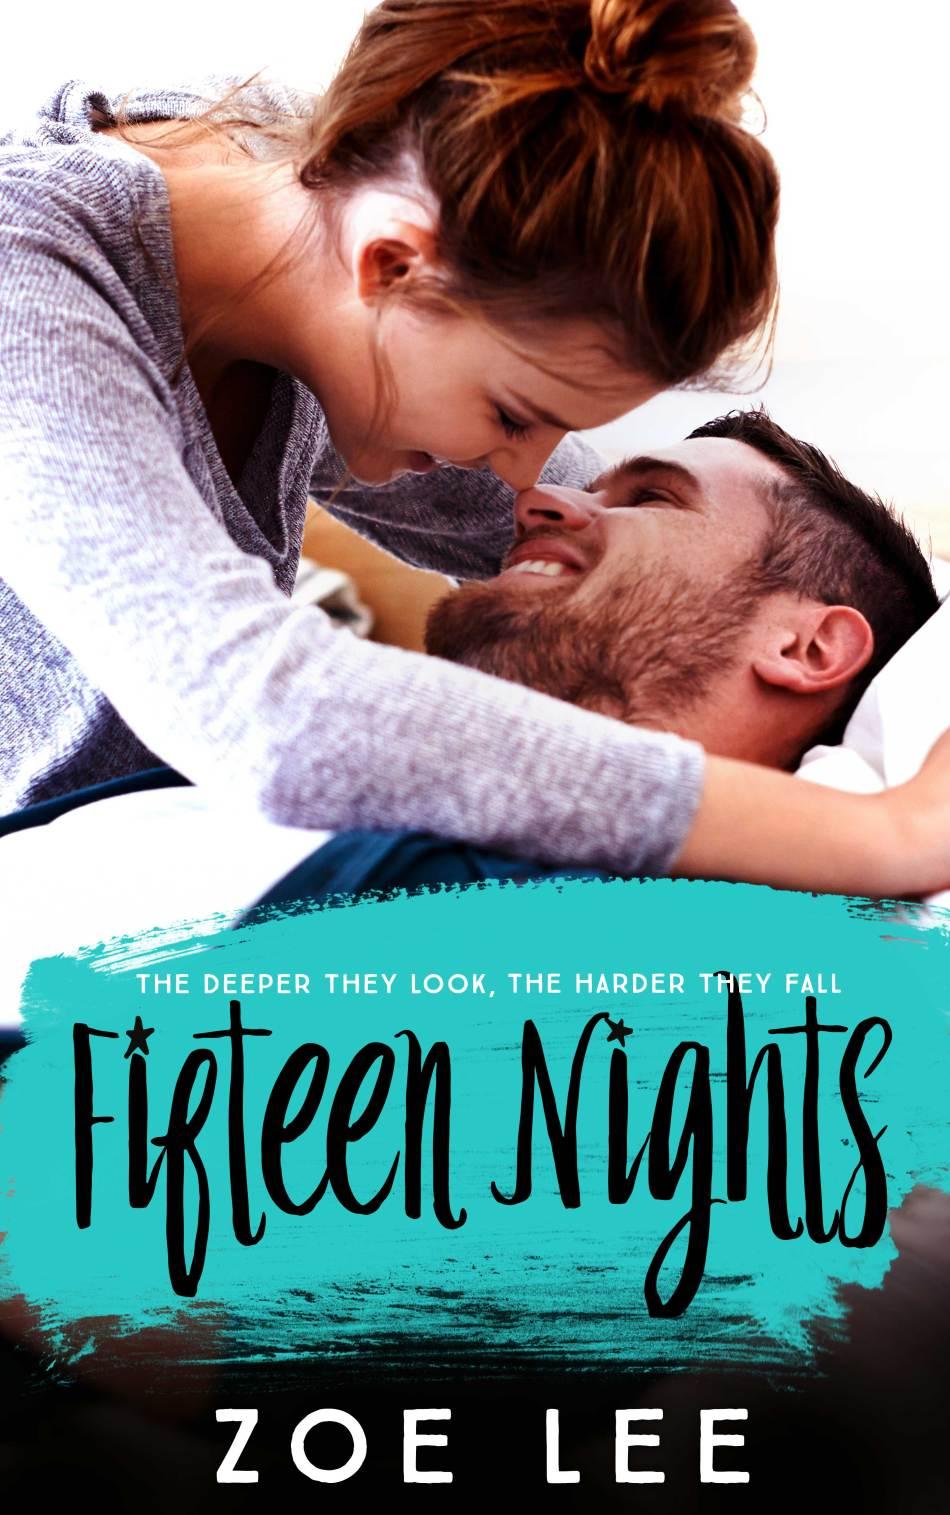 zoe-fifteen-nights-ebook-copy